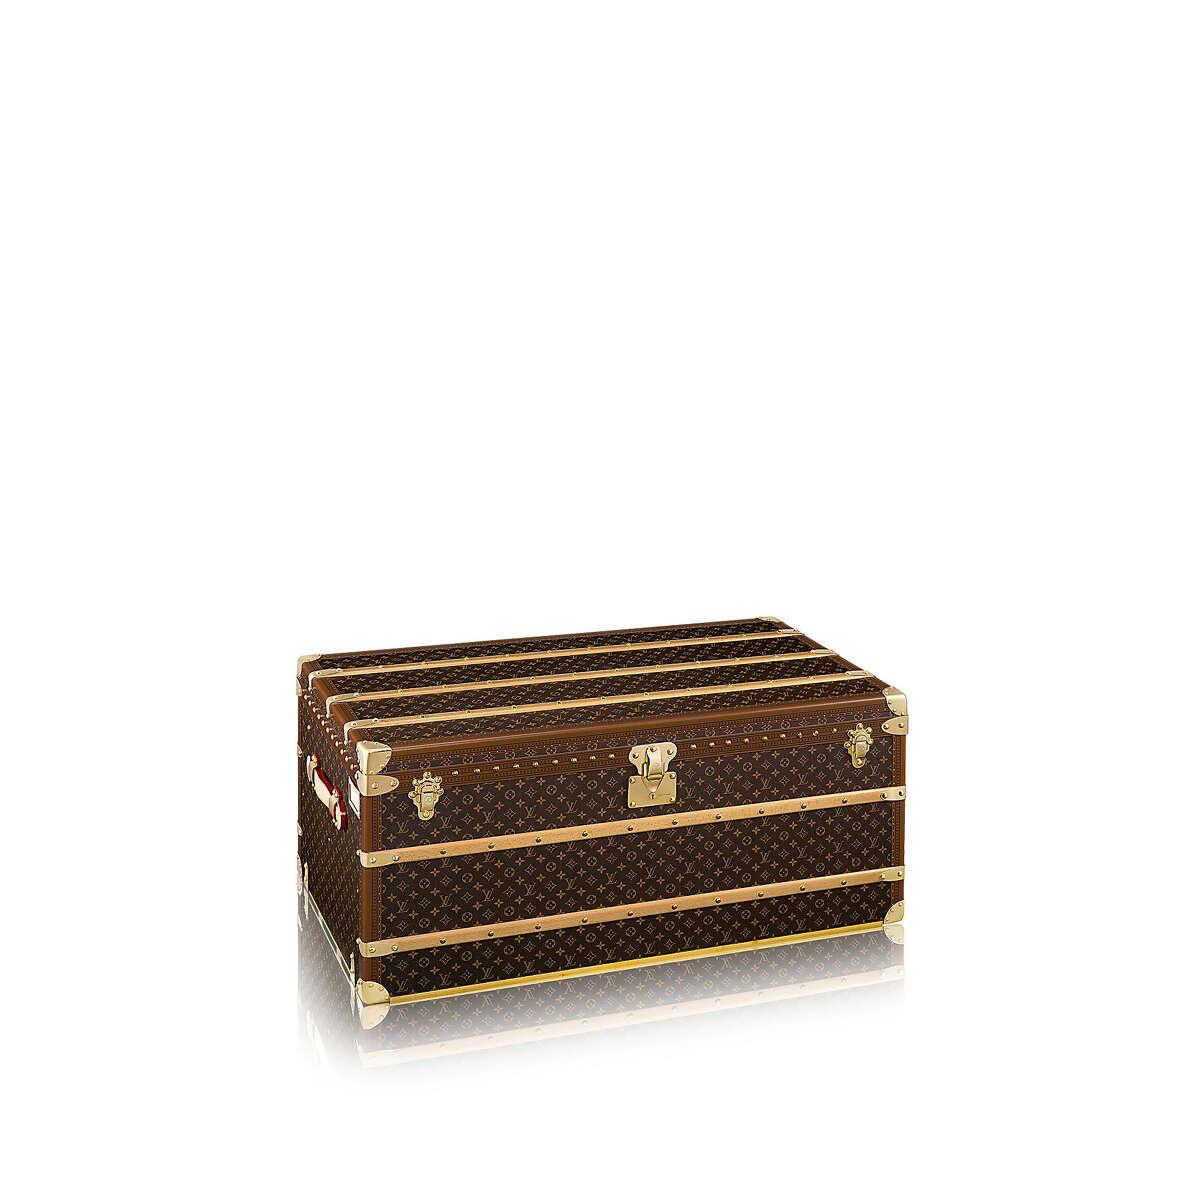 Malle Courrier 110 trunk; $24,700 at Louis Vuitton, Galleria